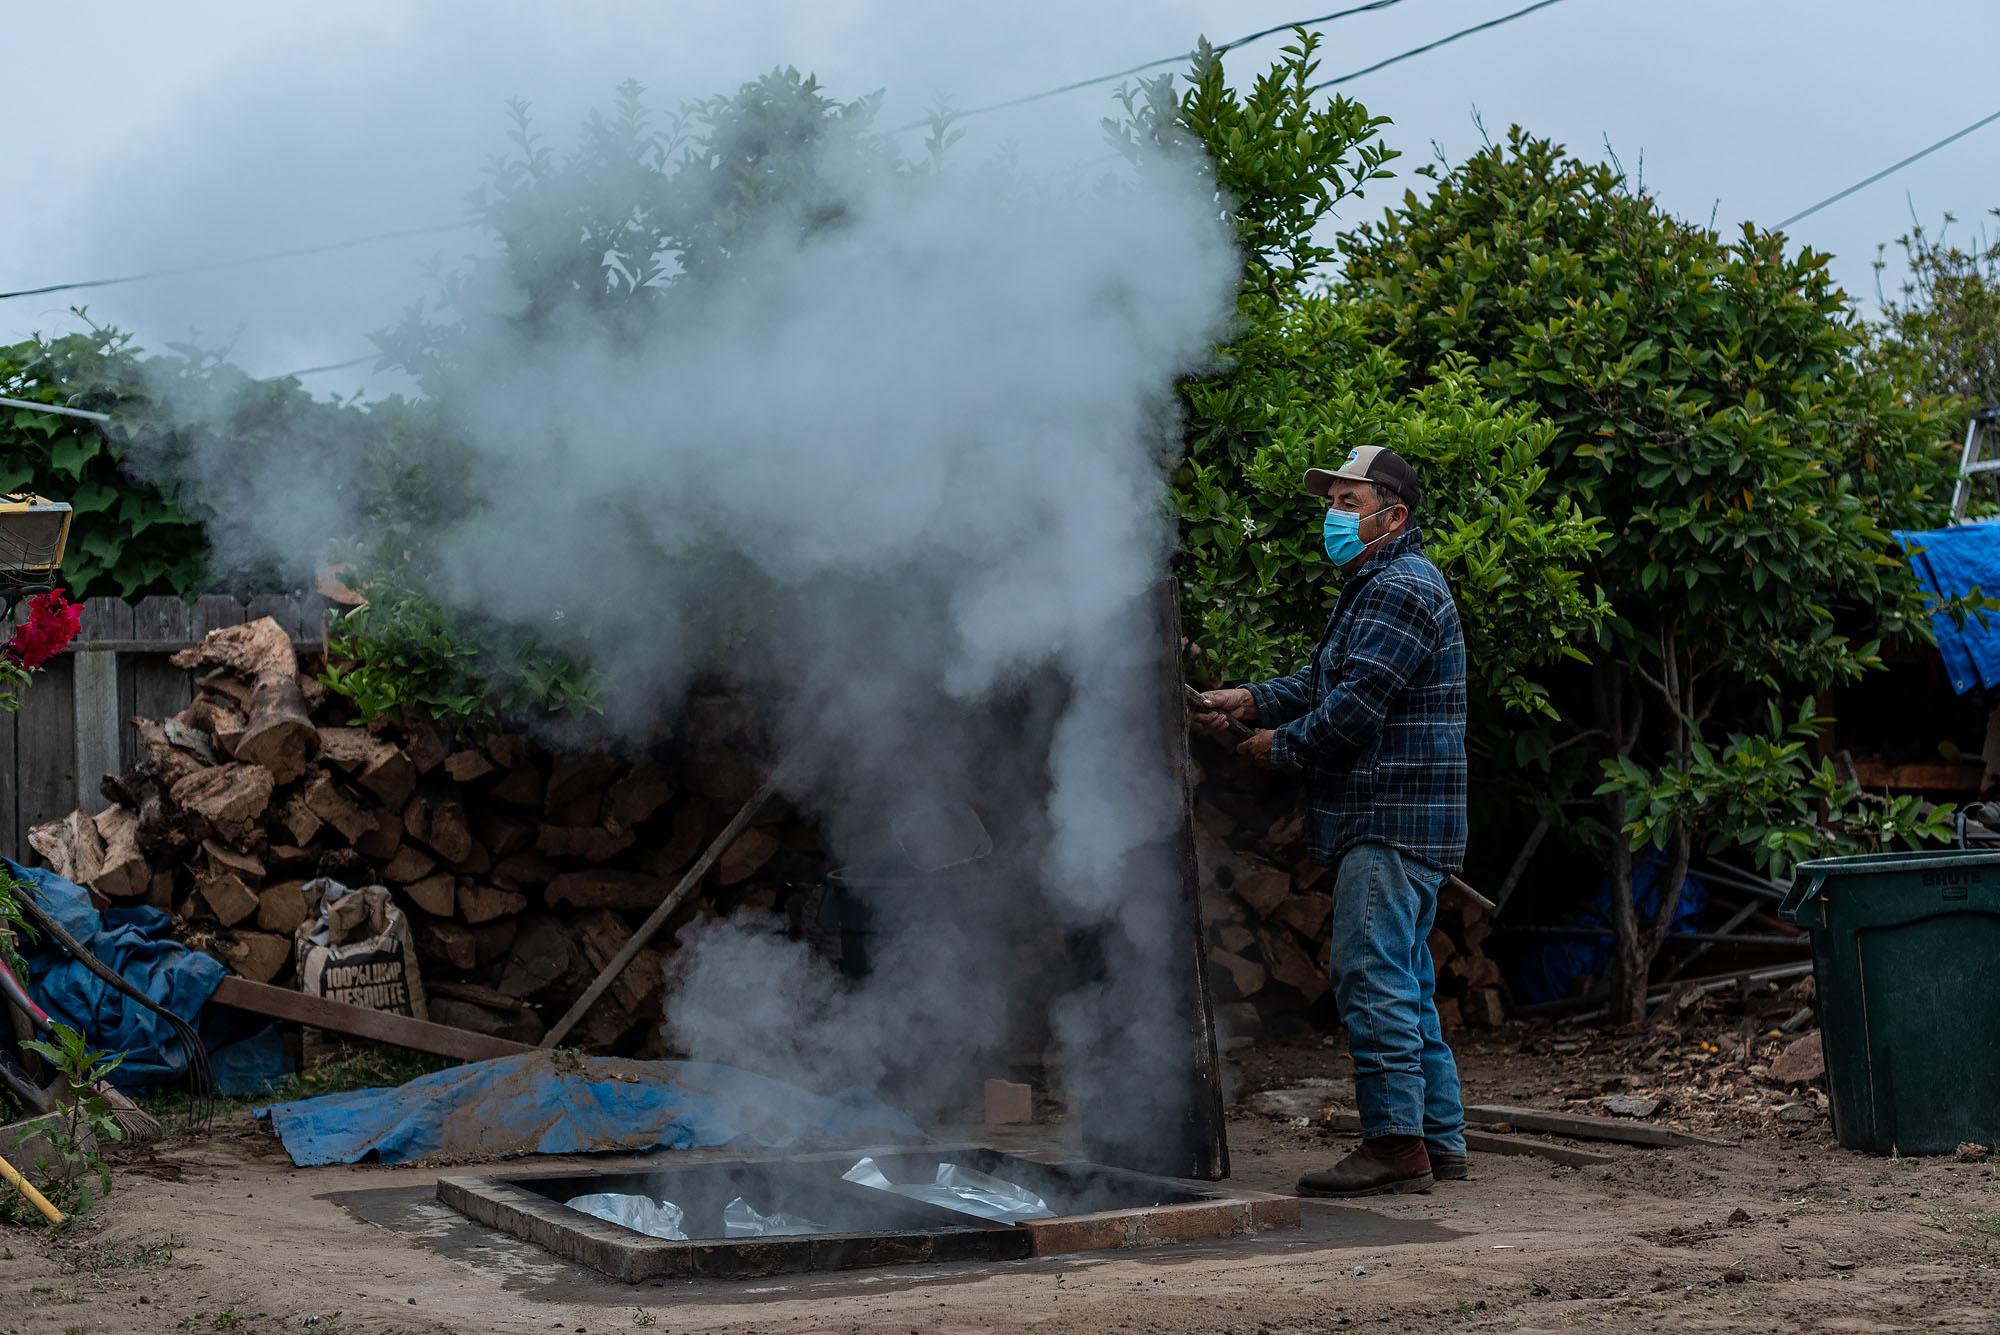 Francisco Bautista opens the pit in his family's backyard in Santa Maria, California.